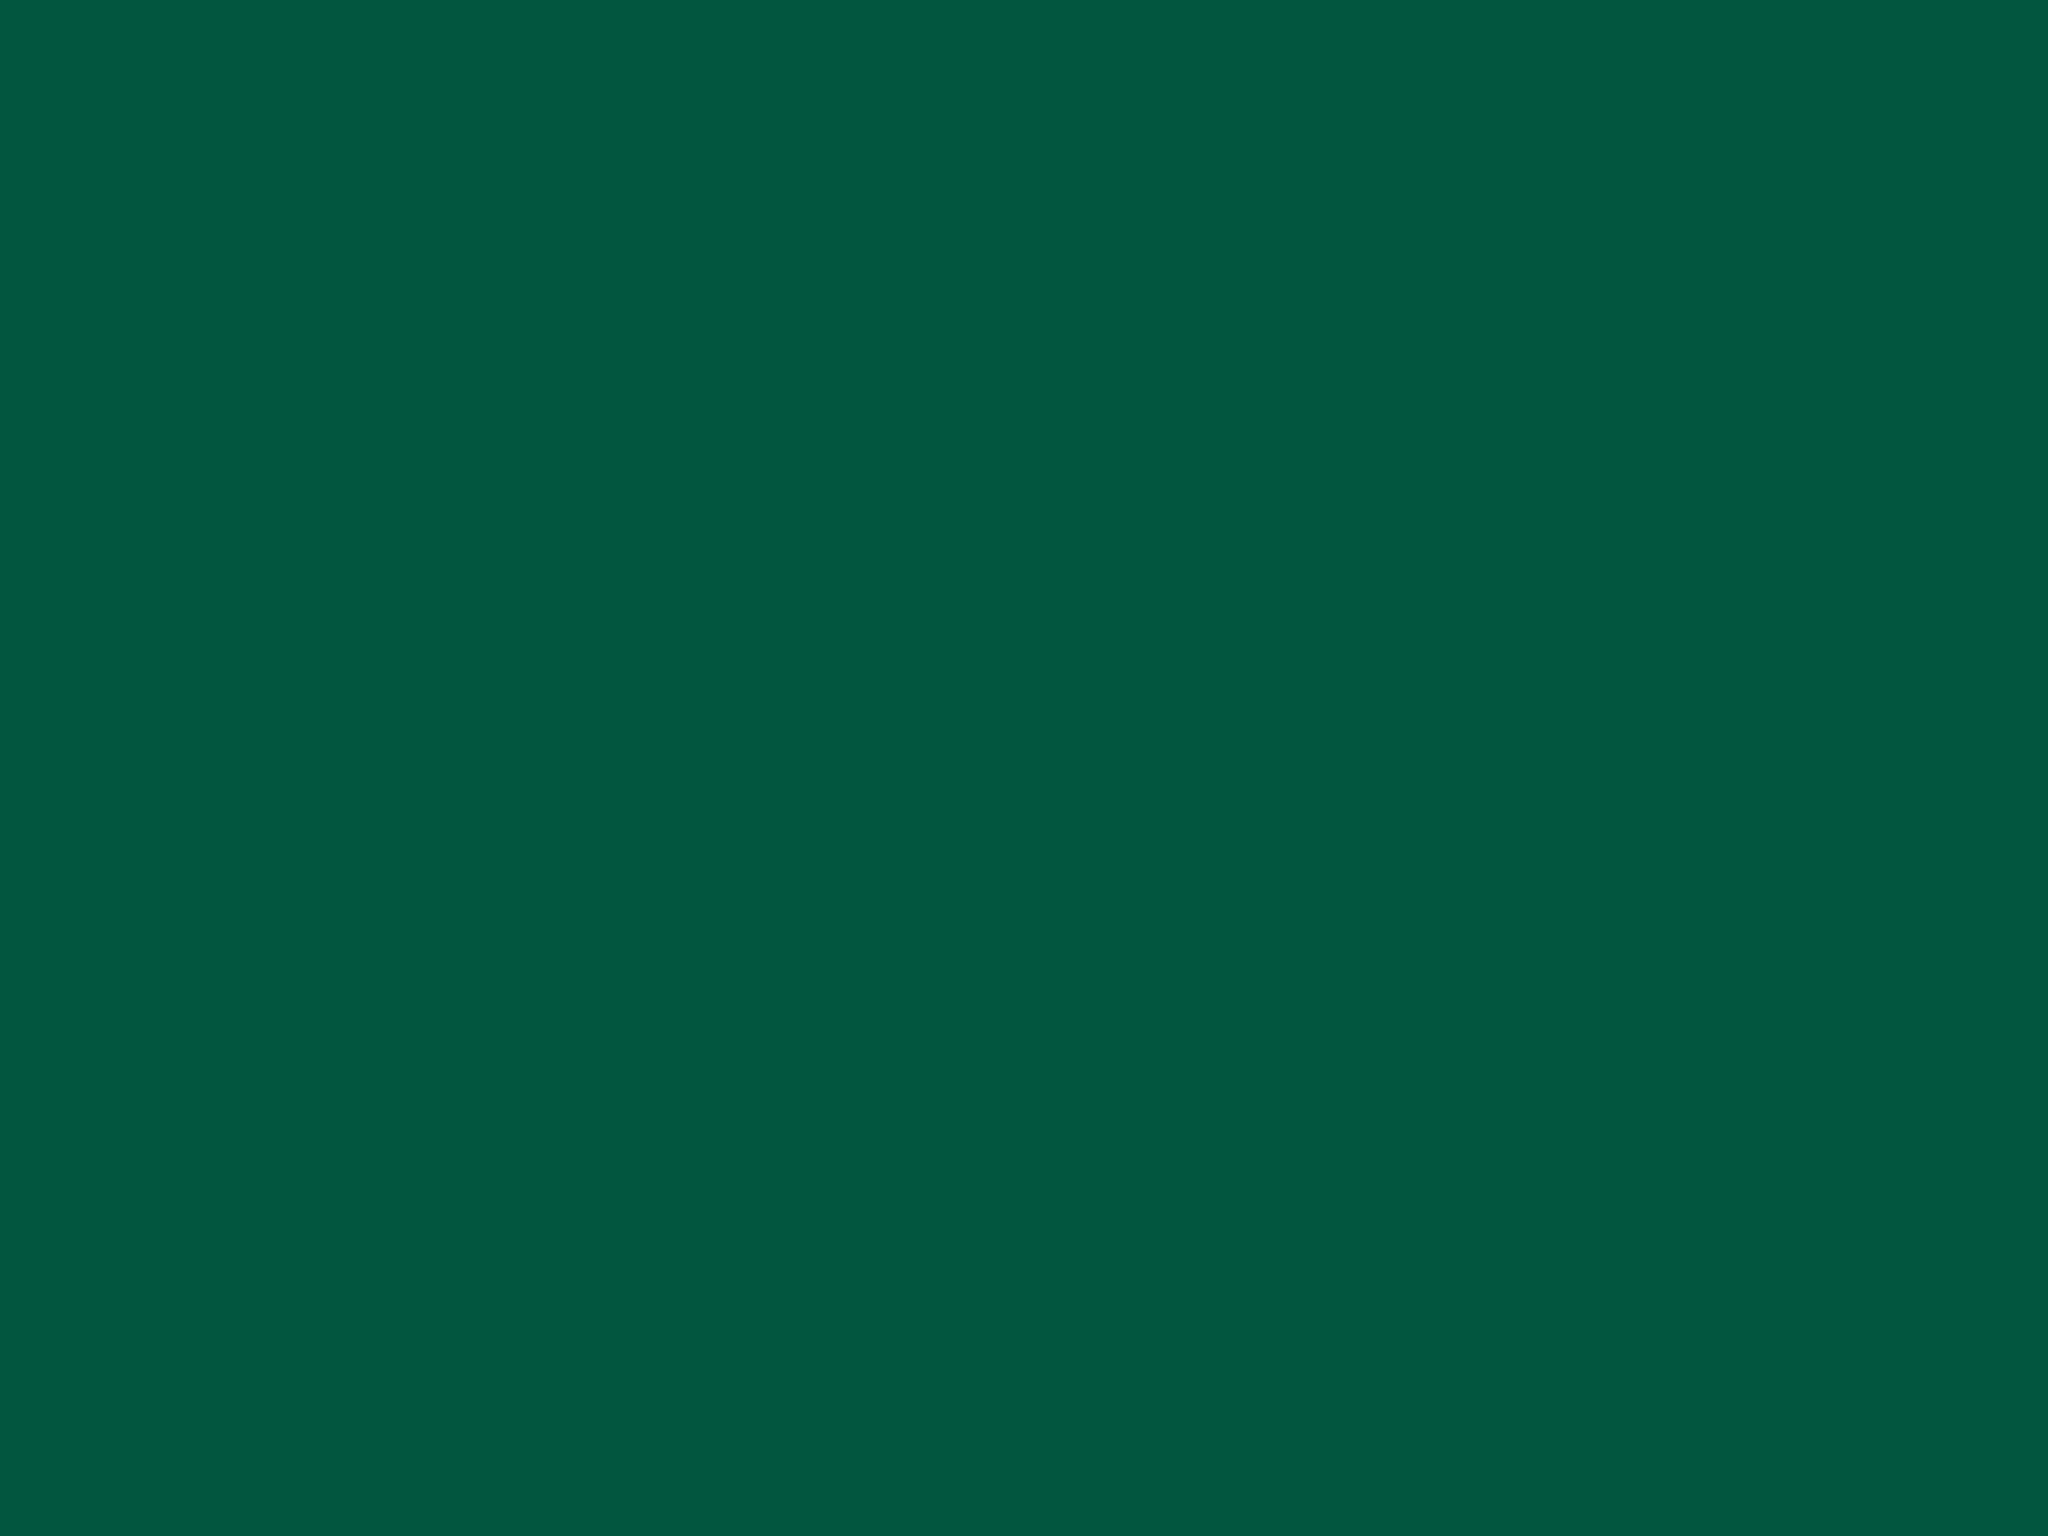 2048x1536 Castleton Green Solid Color Background